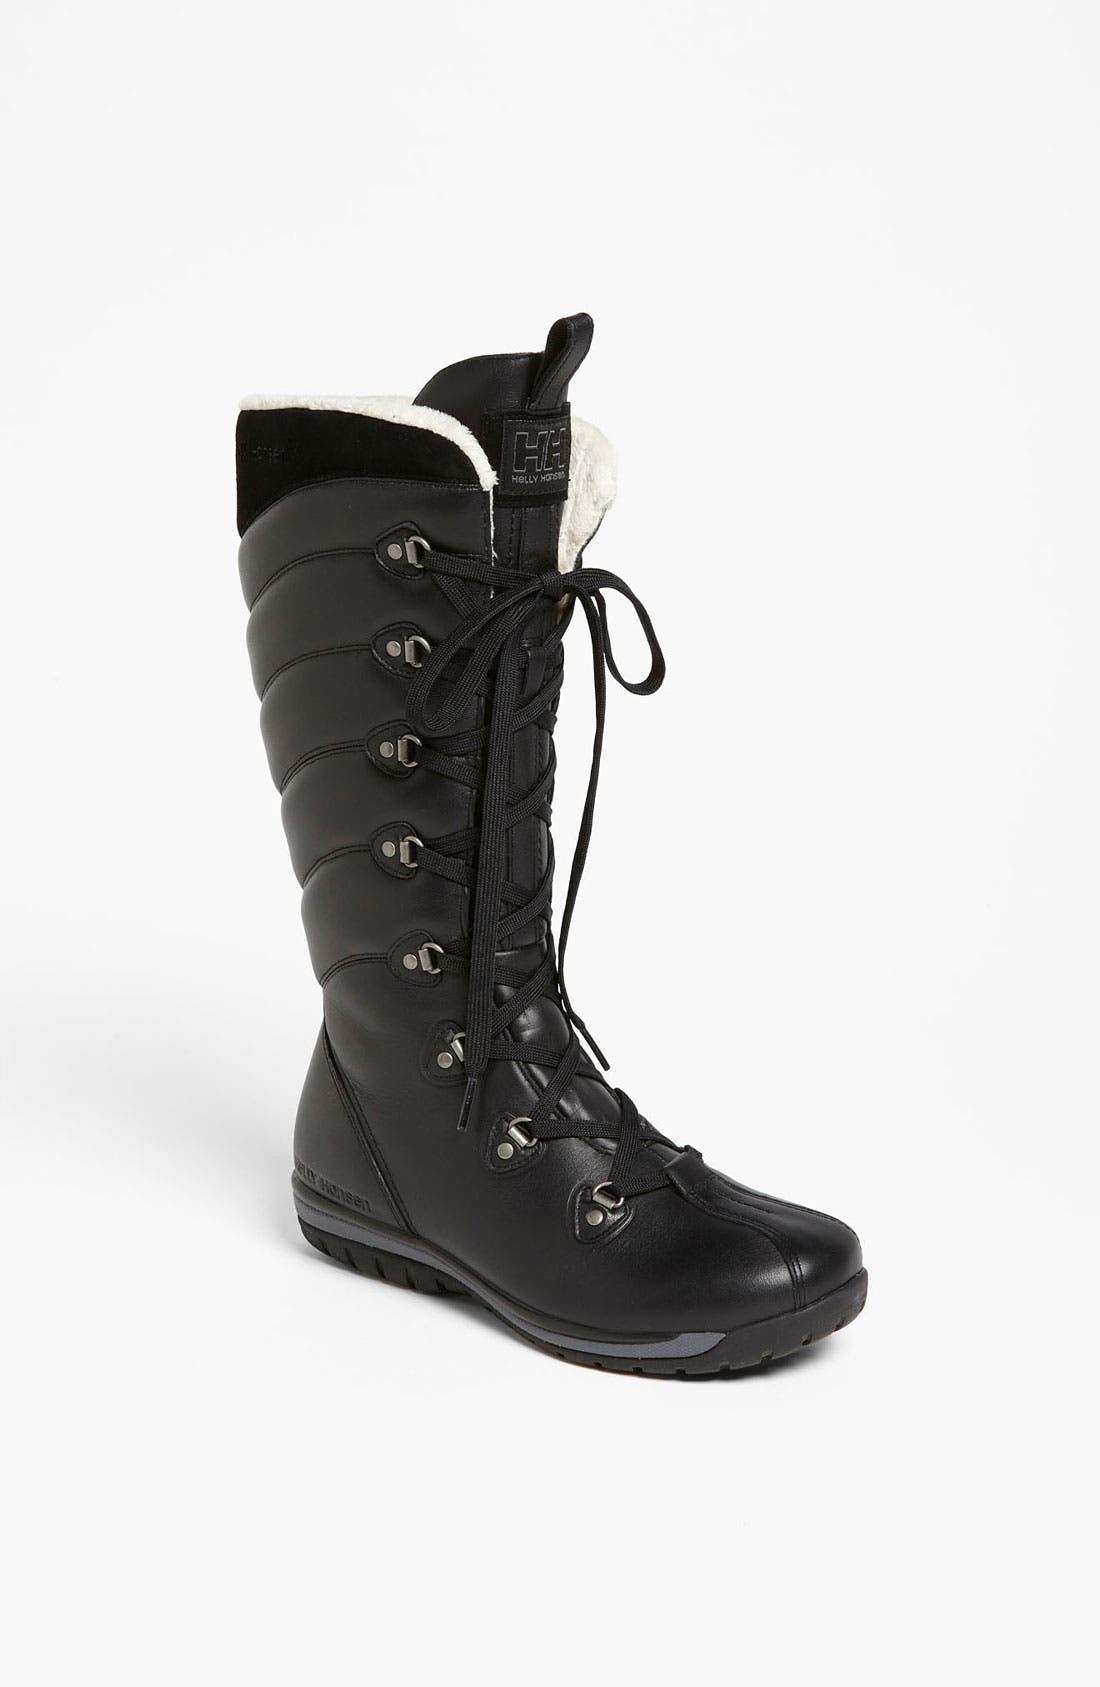 Main Image - Helly Hansen 'Skuld 3' Boot